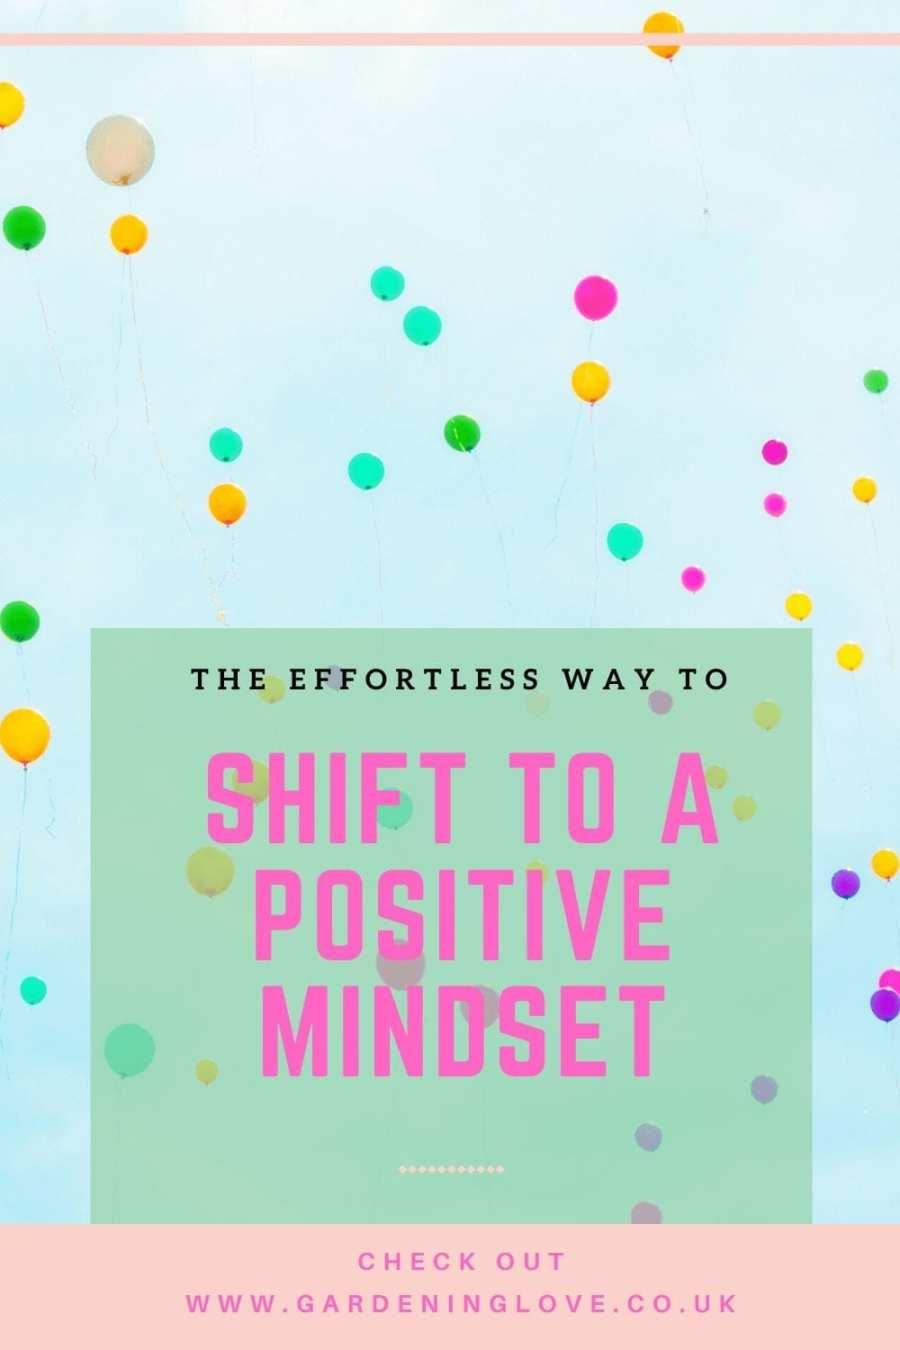 How to shift to a positive mindset #positive #positivity #mindset #bestlife